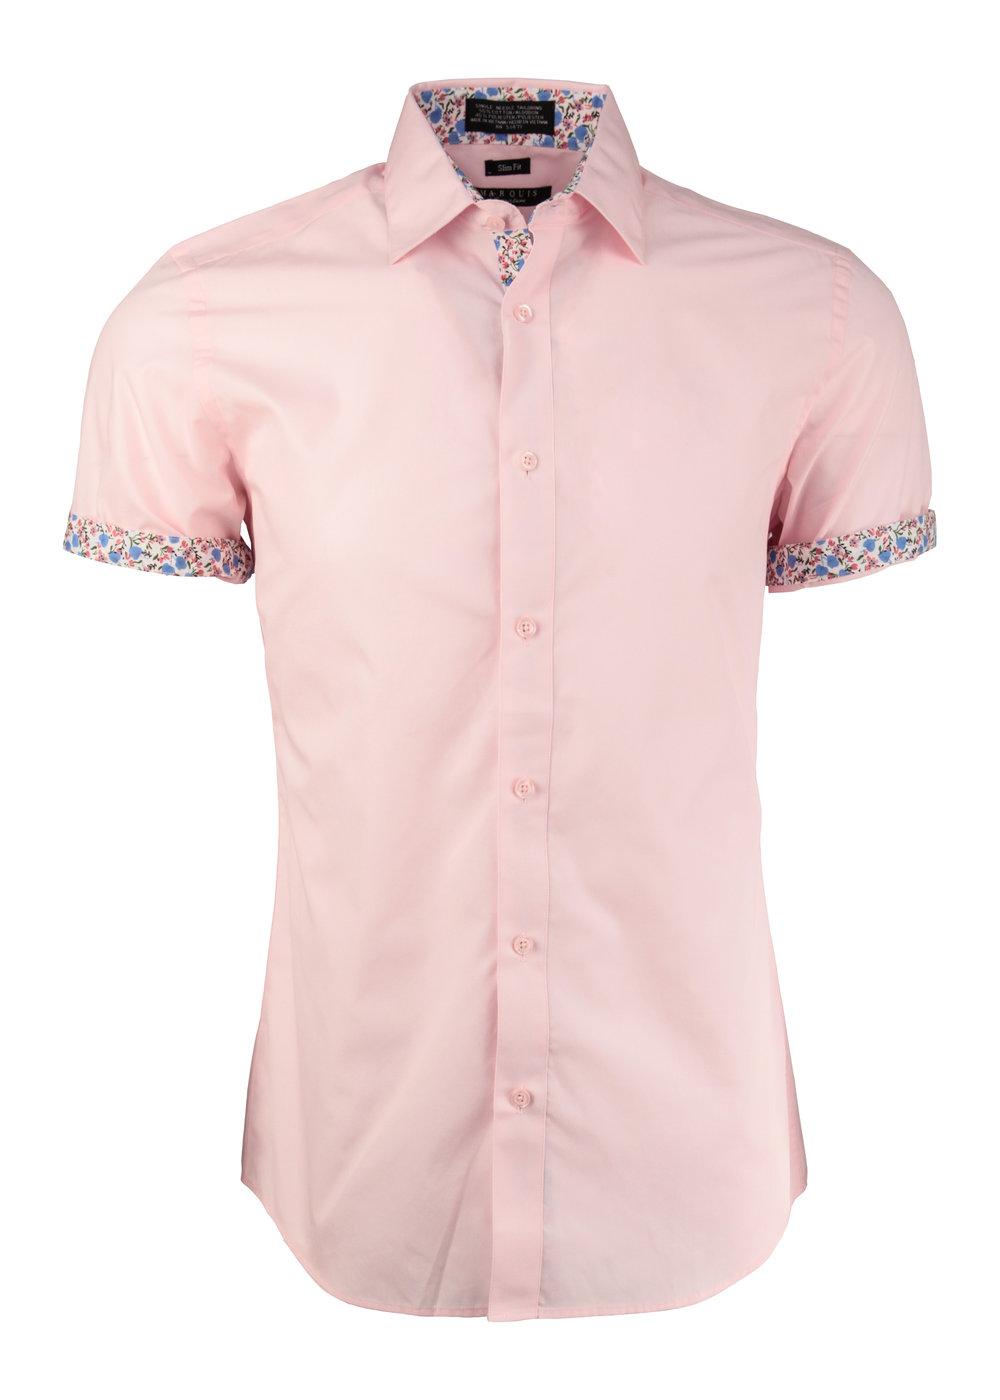 Trimmed Short Sleeved Dress Shirts M A R Q U I S